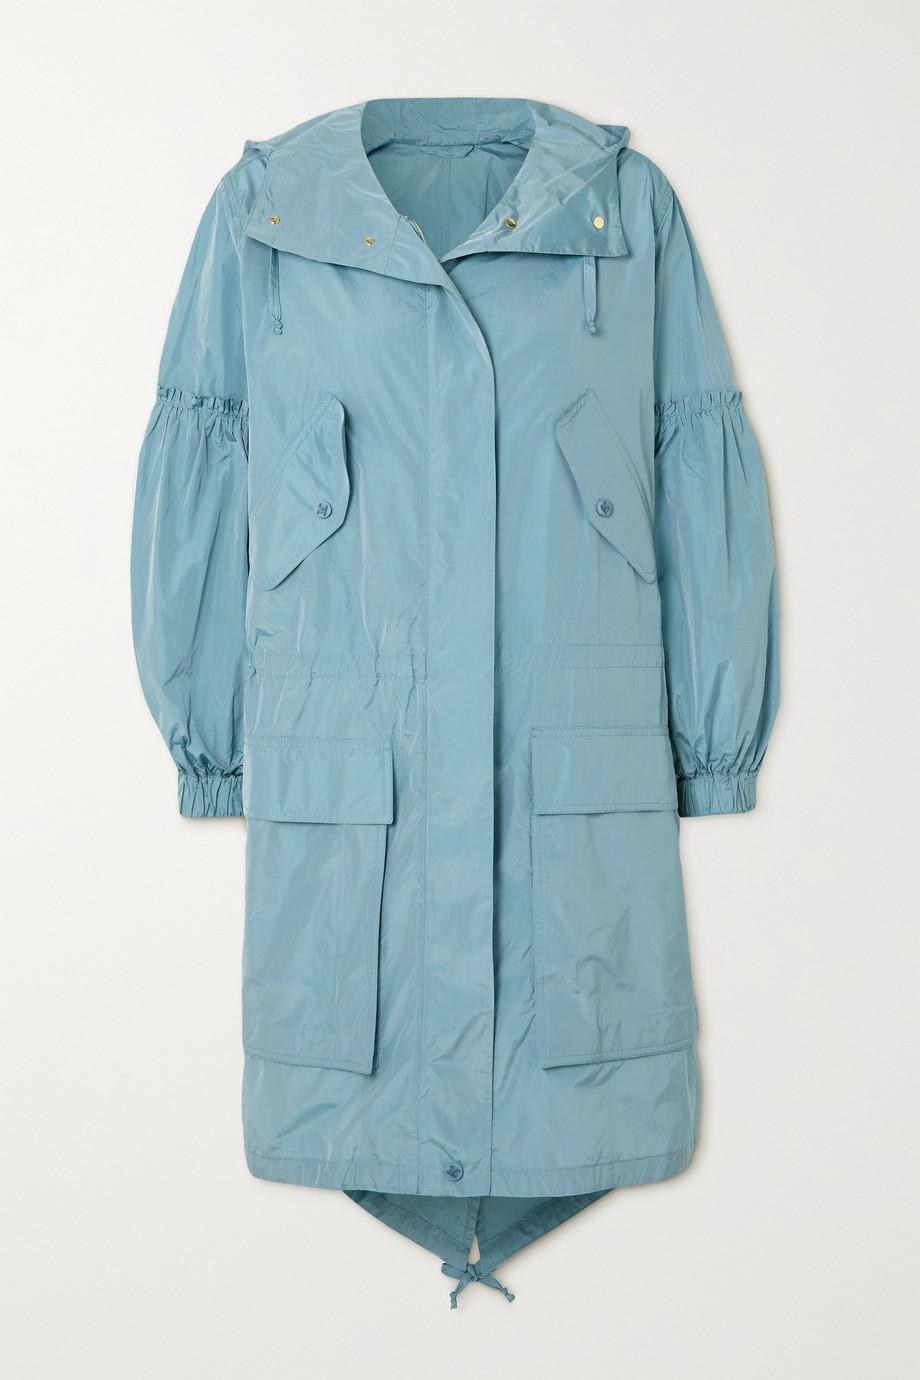 Max Mara Miki gathered taffeta jacket